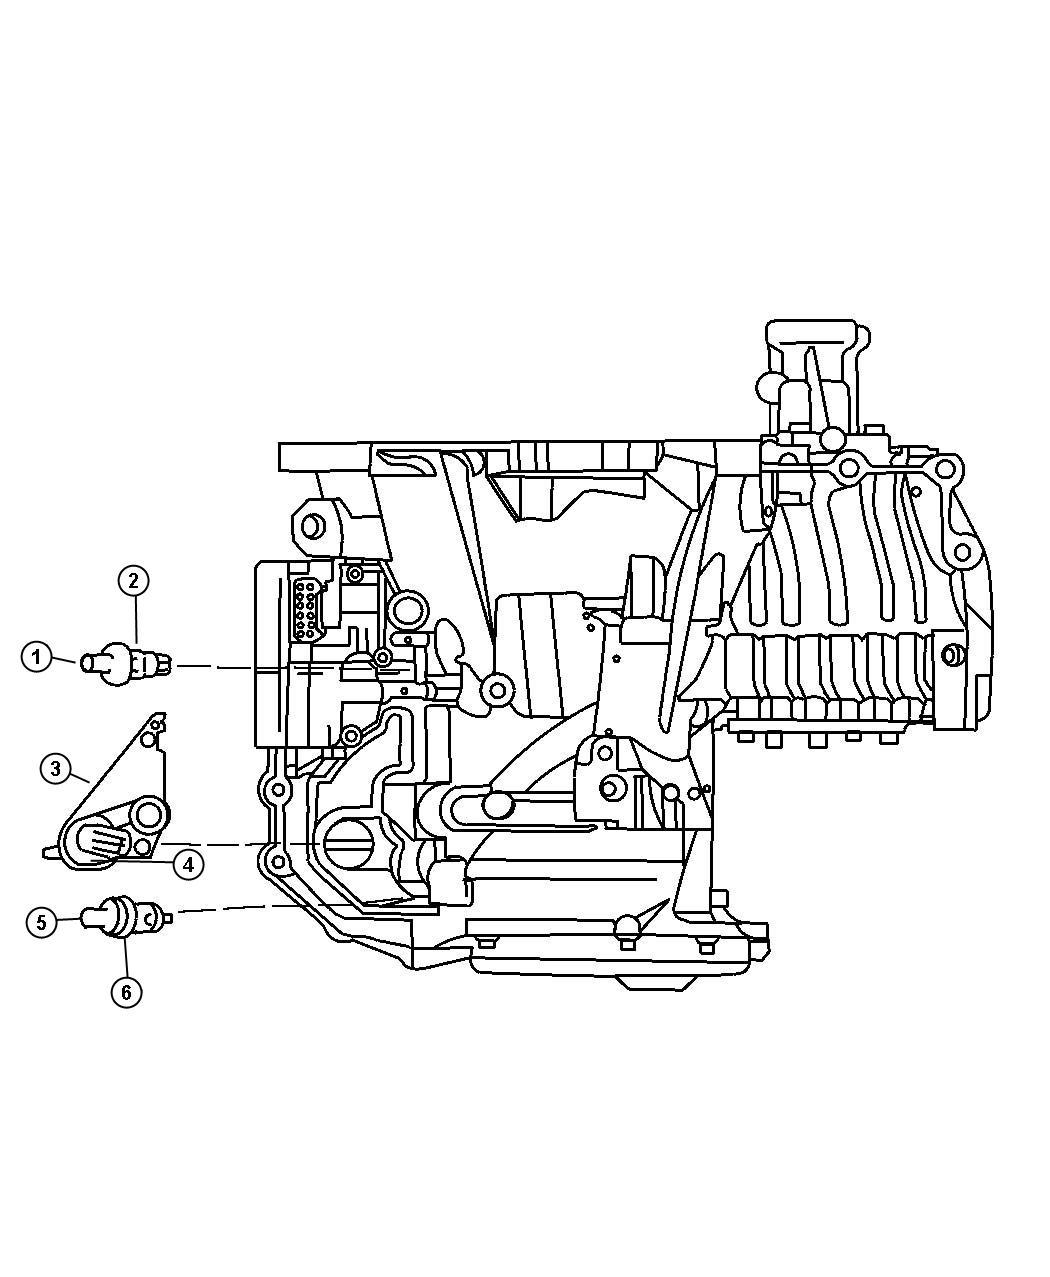 2004 Dodge Grand Caravan Sensors, Transmission